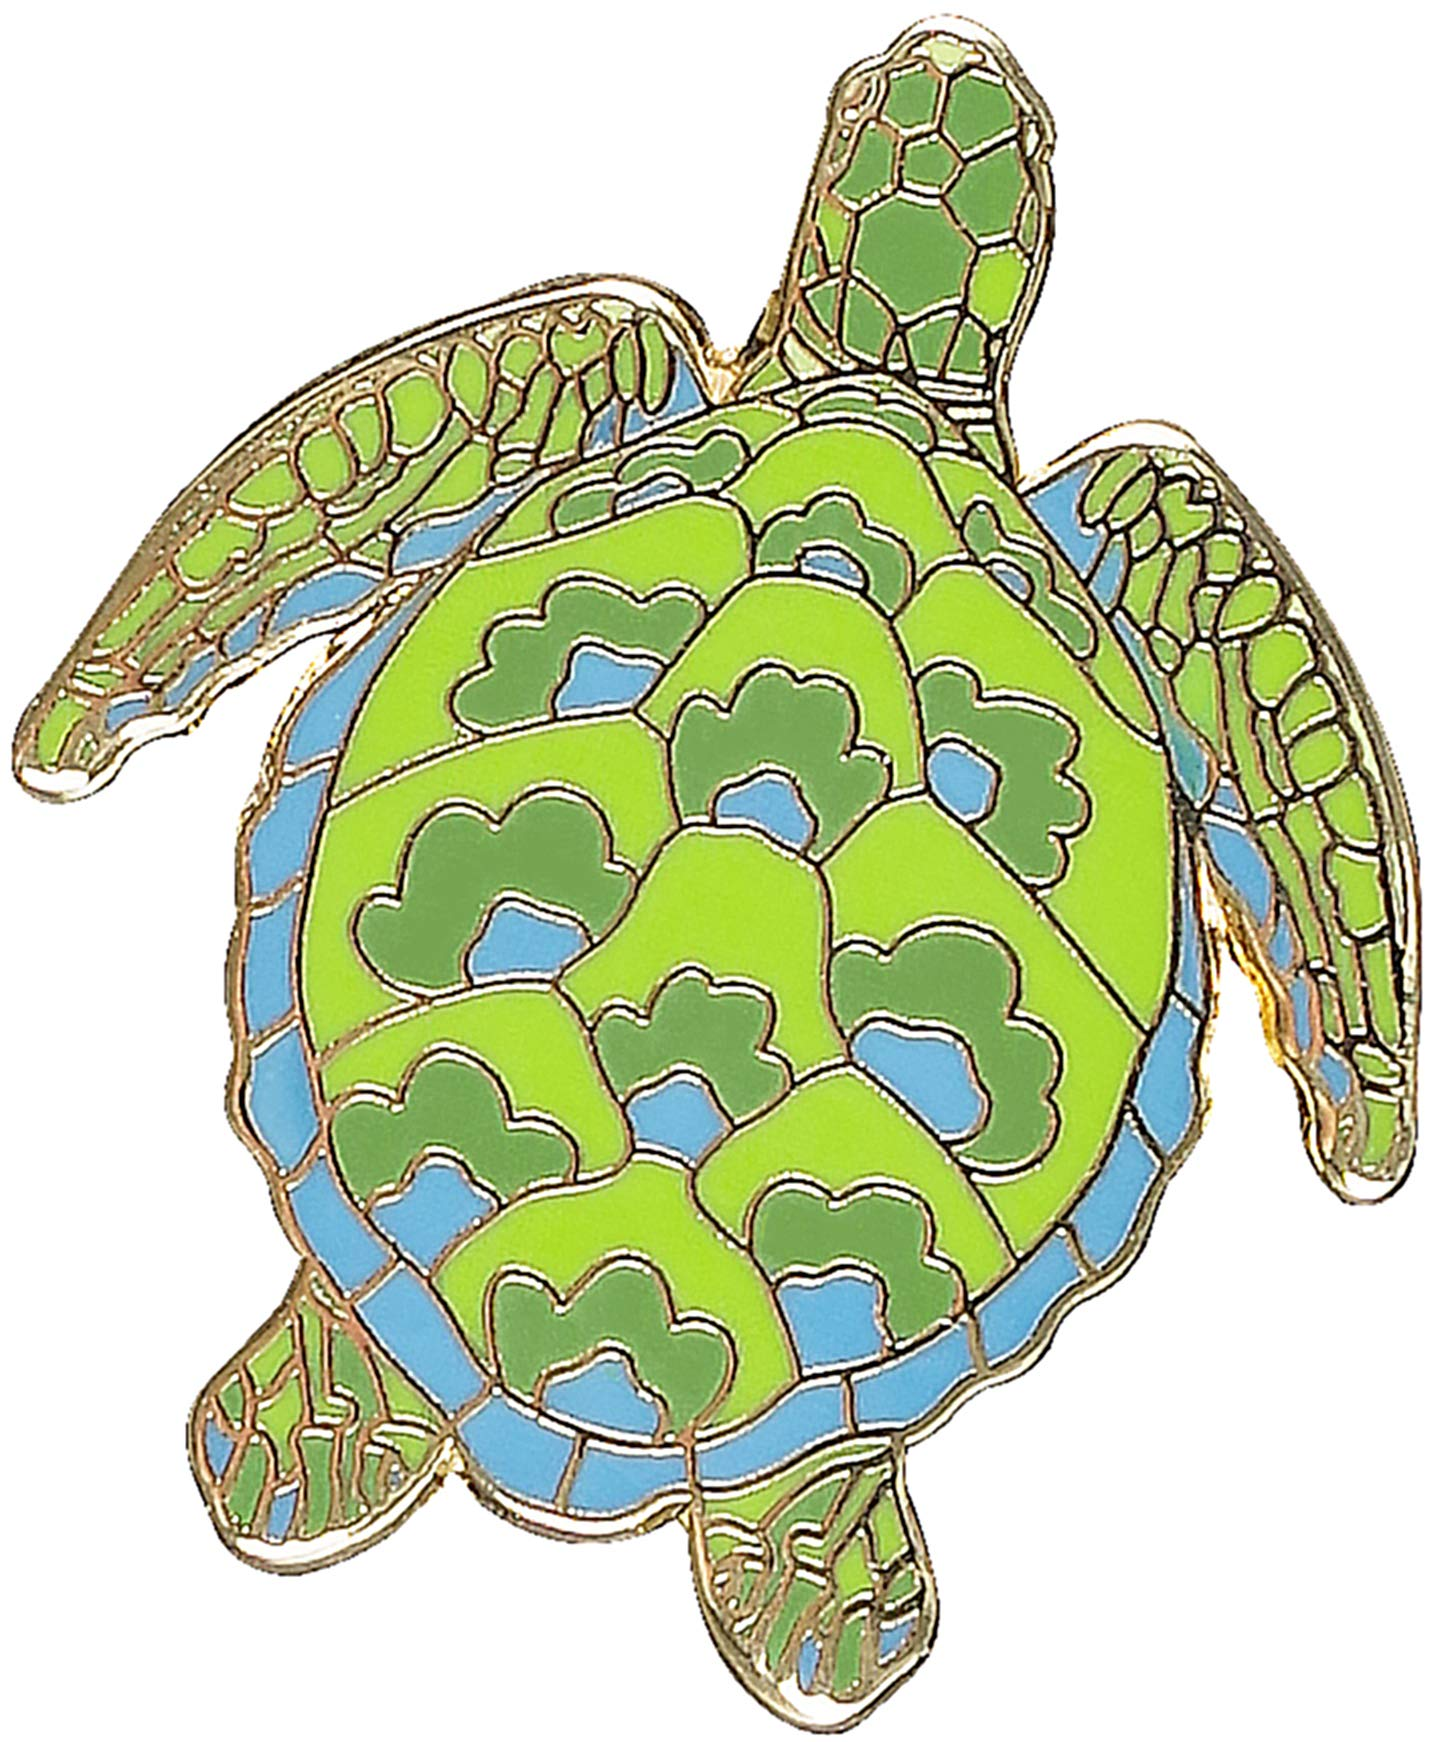 Leatherback turtle Loggerhead turtle Green turtle Hawksbill turtle Endangered species Sea Turtles 4-Button Set 1.25 round pinback buttons